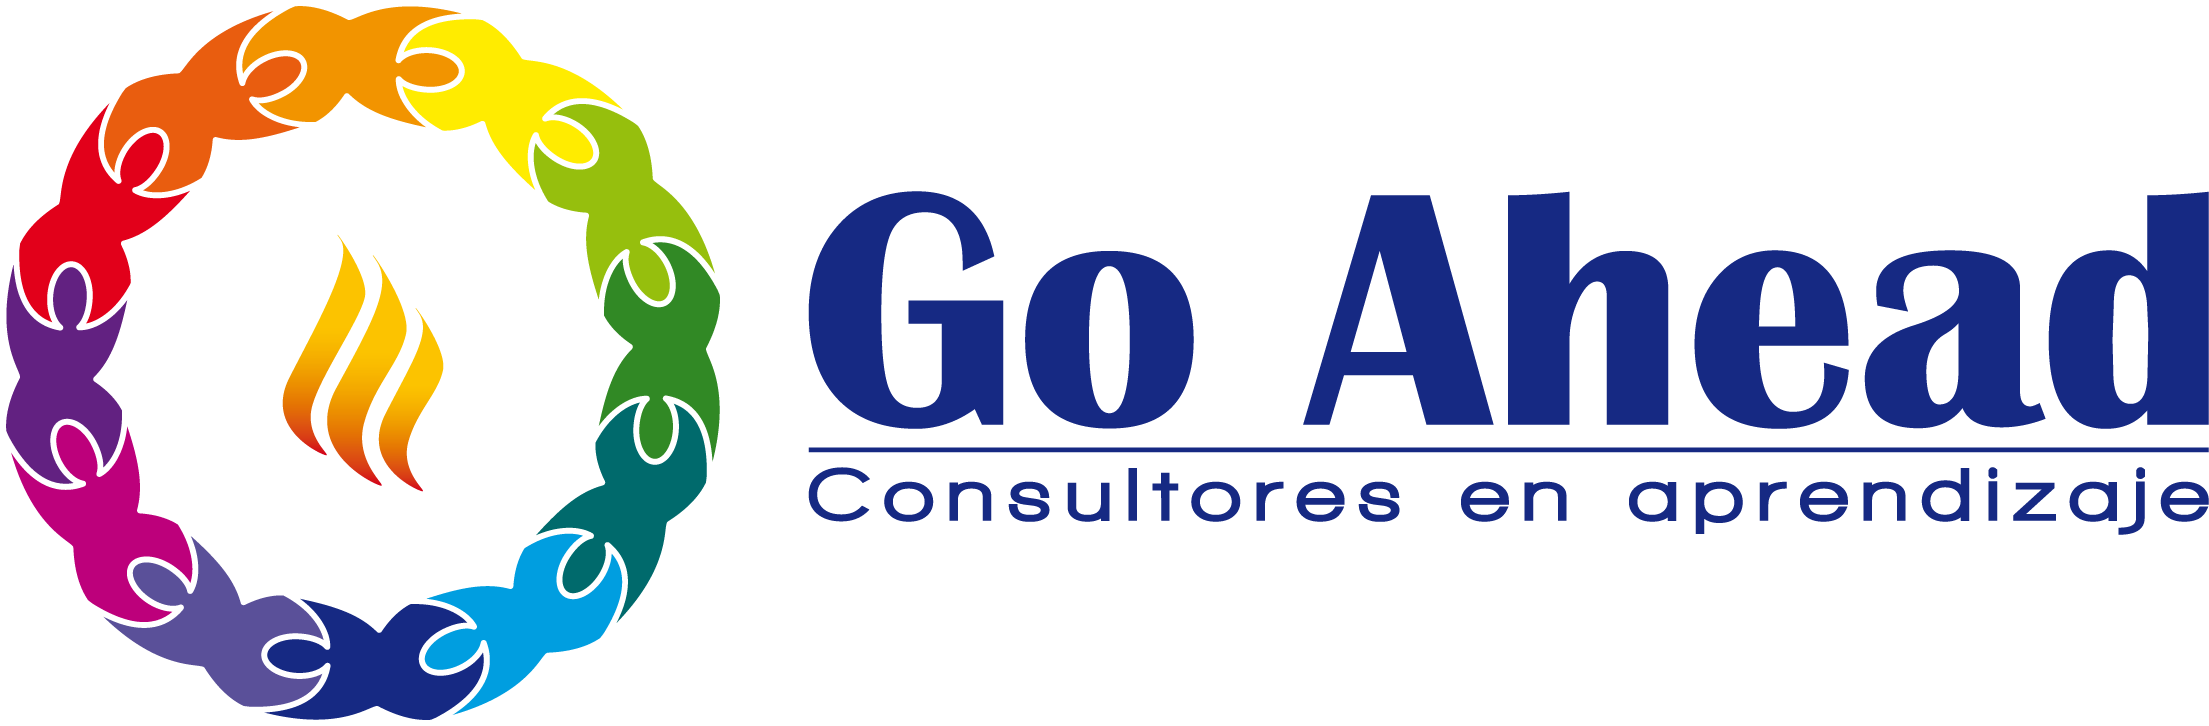 Go ahead consultores